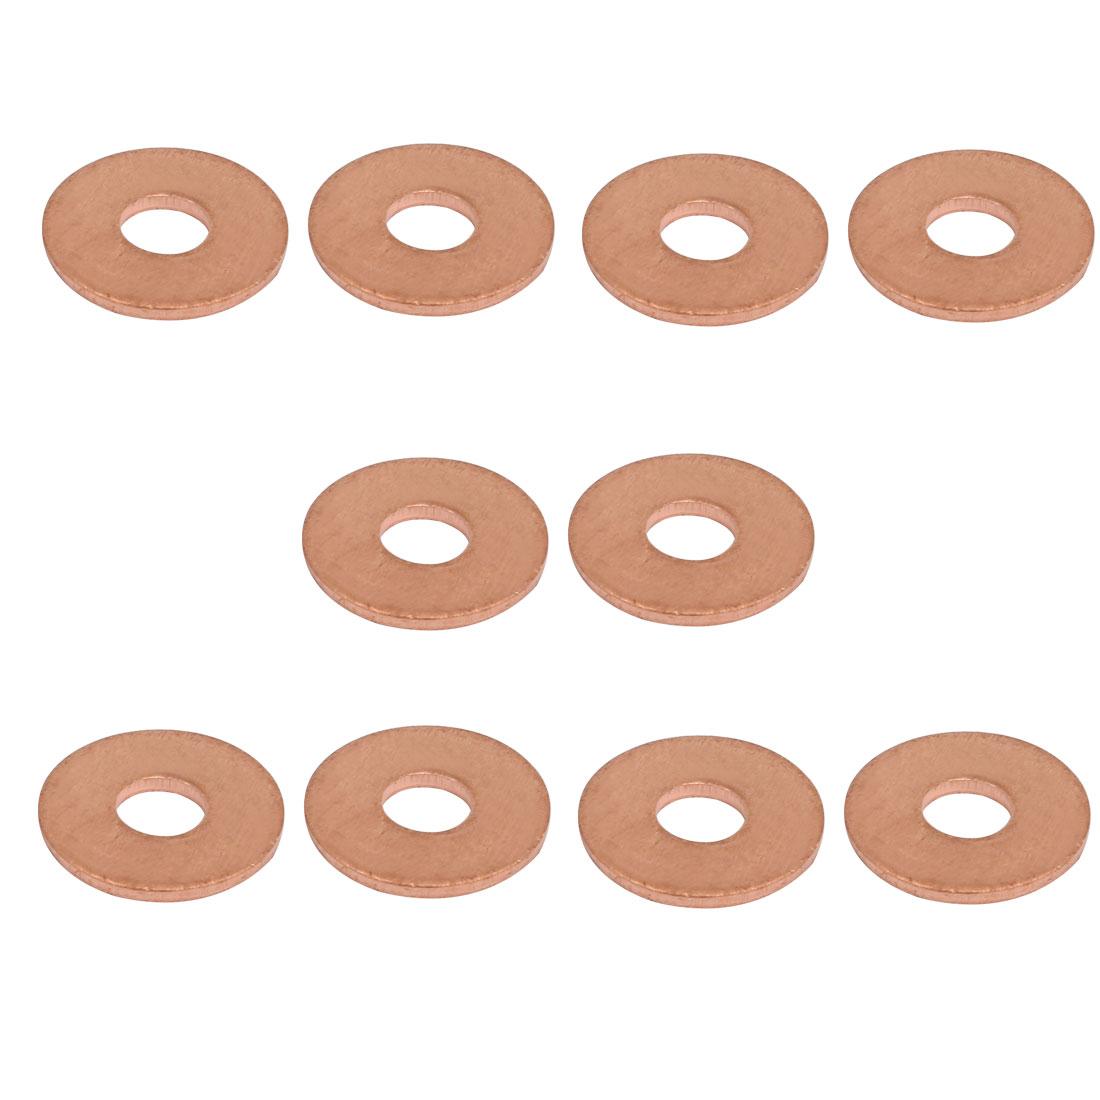 10pcs 6mmx18mmx1.5mm Copper Flat Ring Sealing Crush Washer Gasket